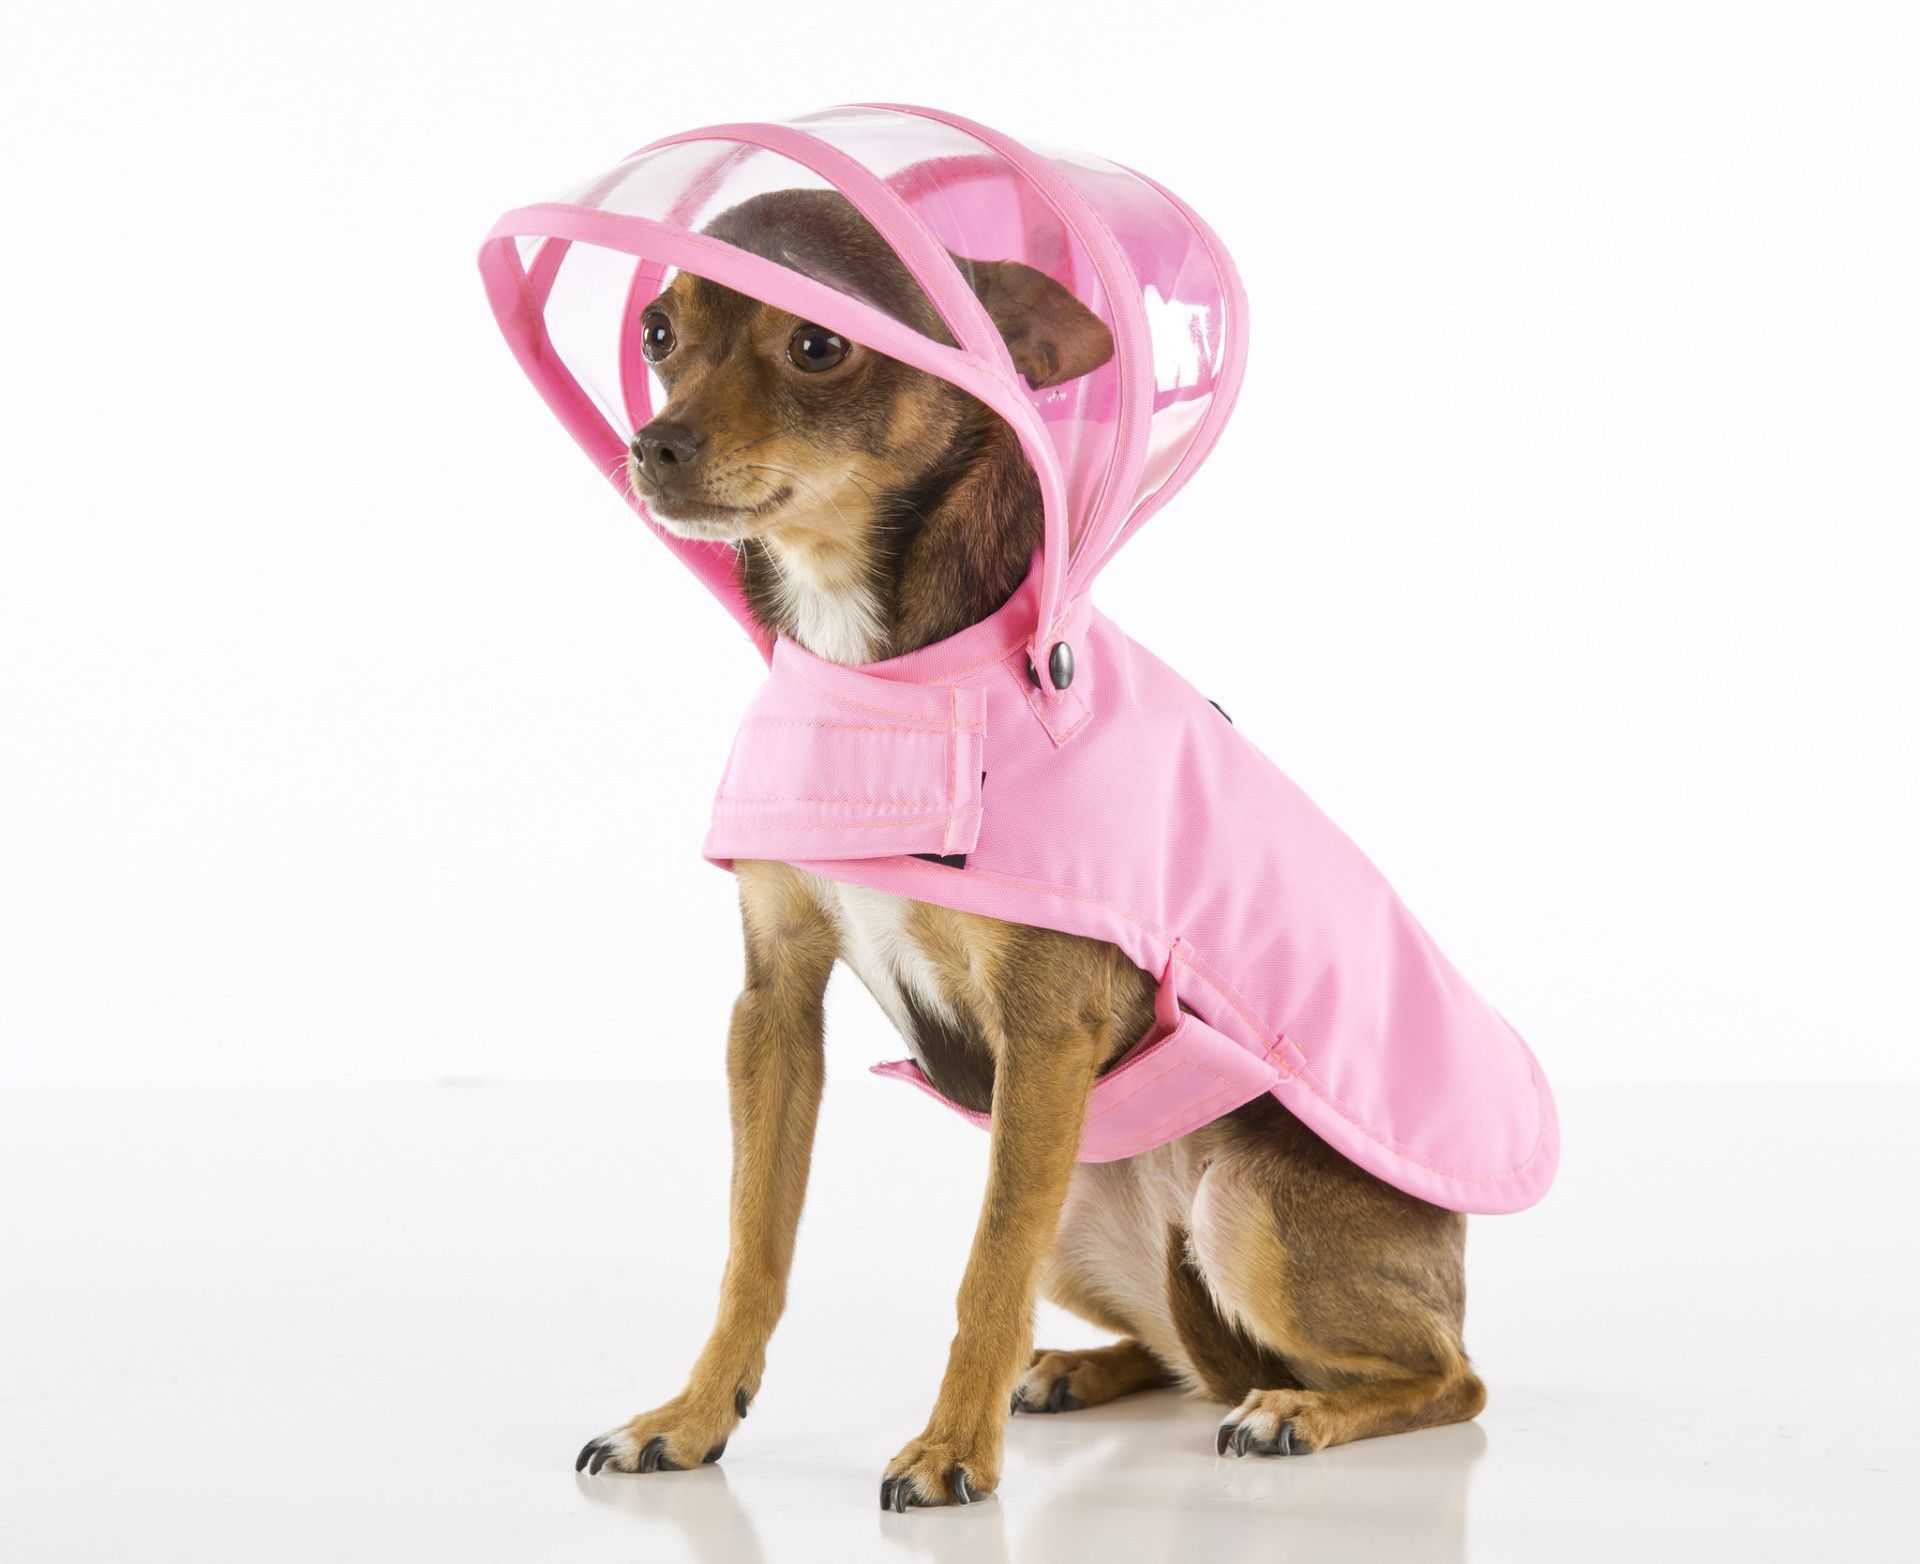 b1bd0d0f8cd Dog Raincoat - Solid Pink Dog Raincoat, Your Dog, Rainbow, Pink, Dogs